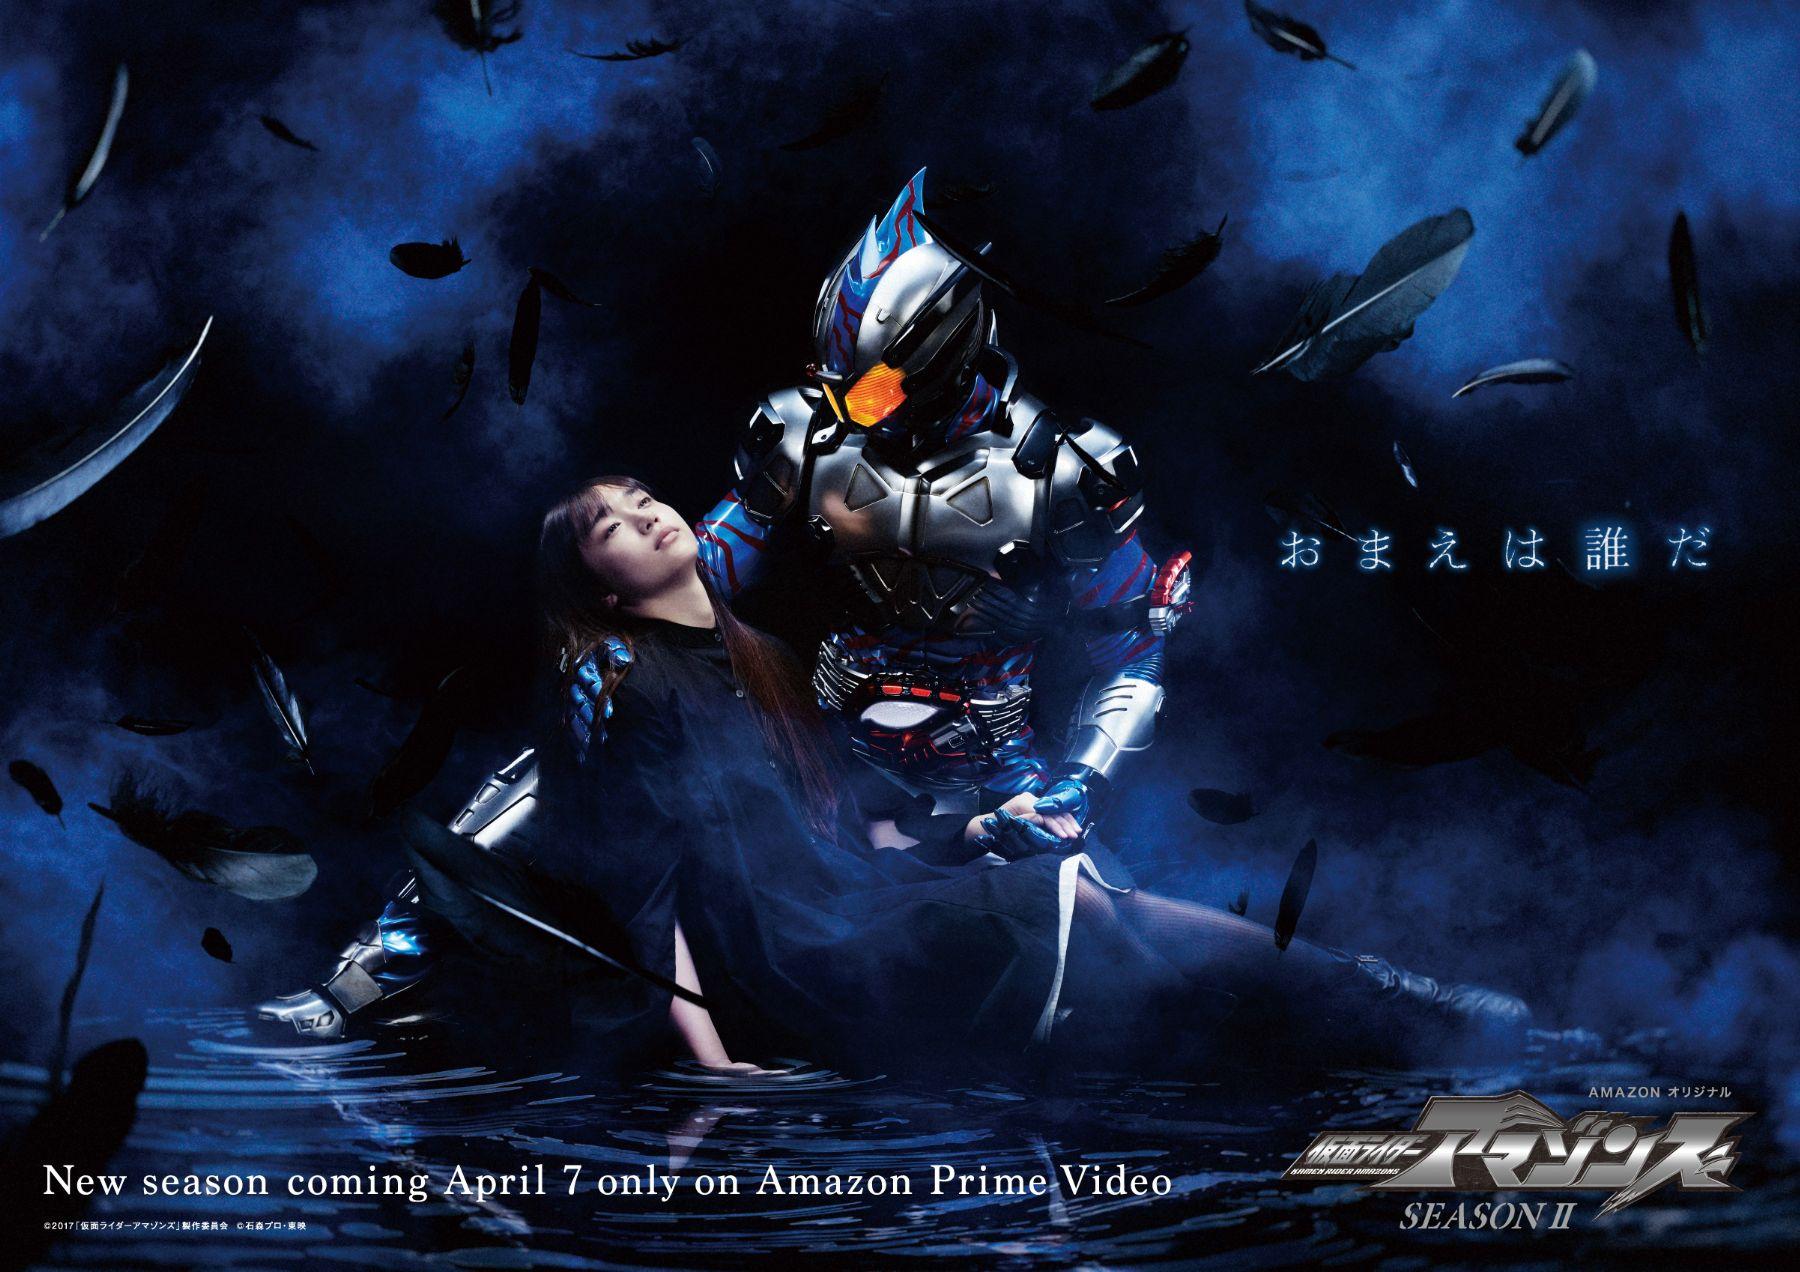 Kamen Rider Amazons Tv Mini Series 20162017 Imdb